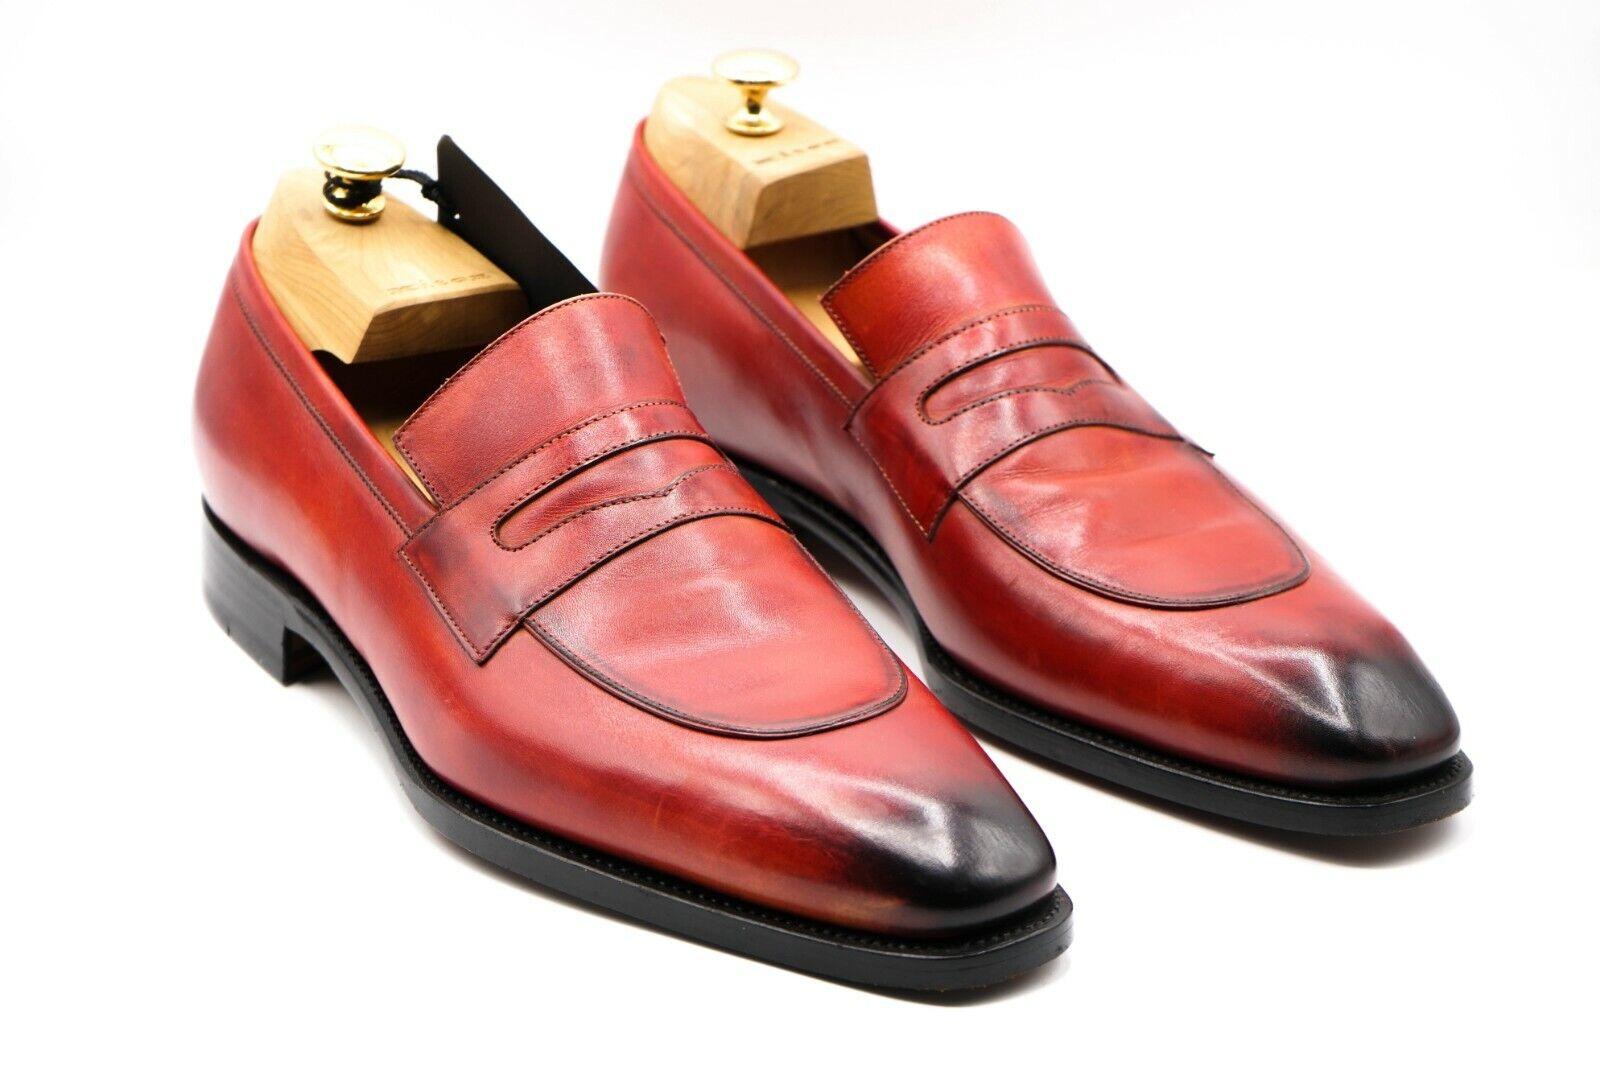 NEW KITON Napoli Dress Leather Shoes Size Eu 43.5 Uk 9.5 Us 10.5 (KIS46)